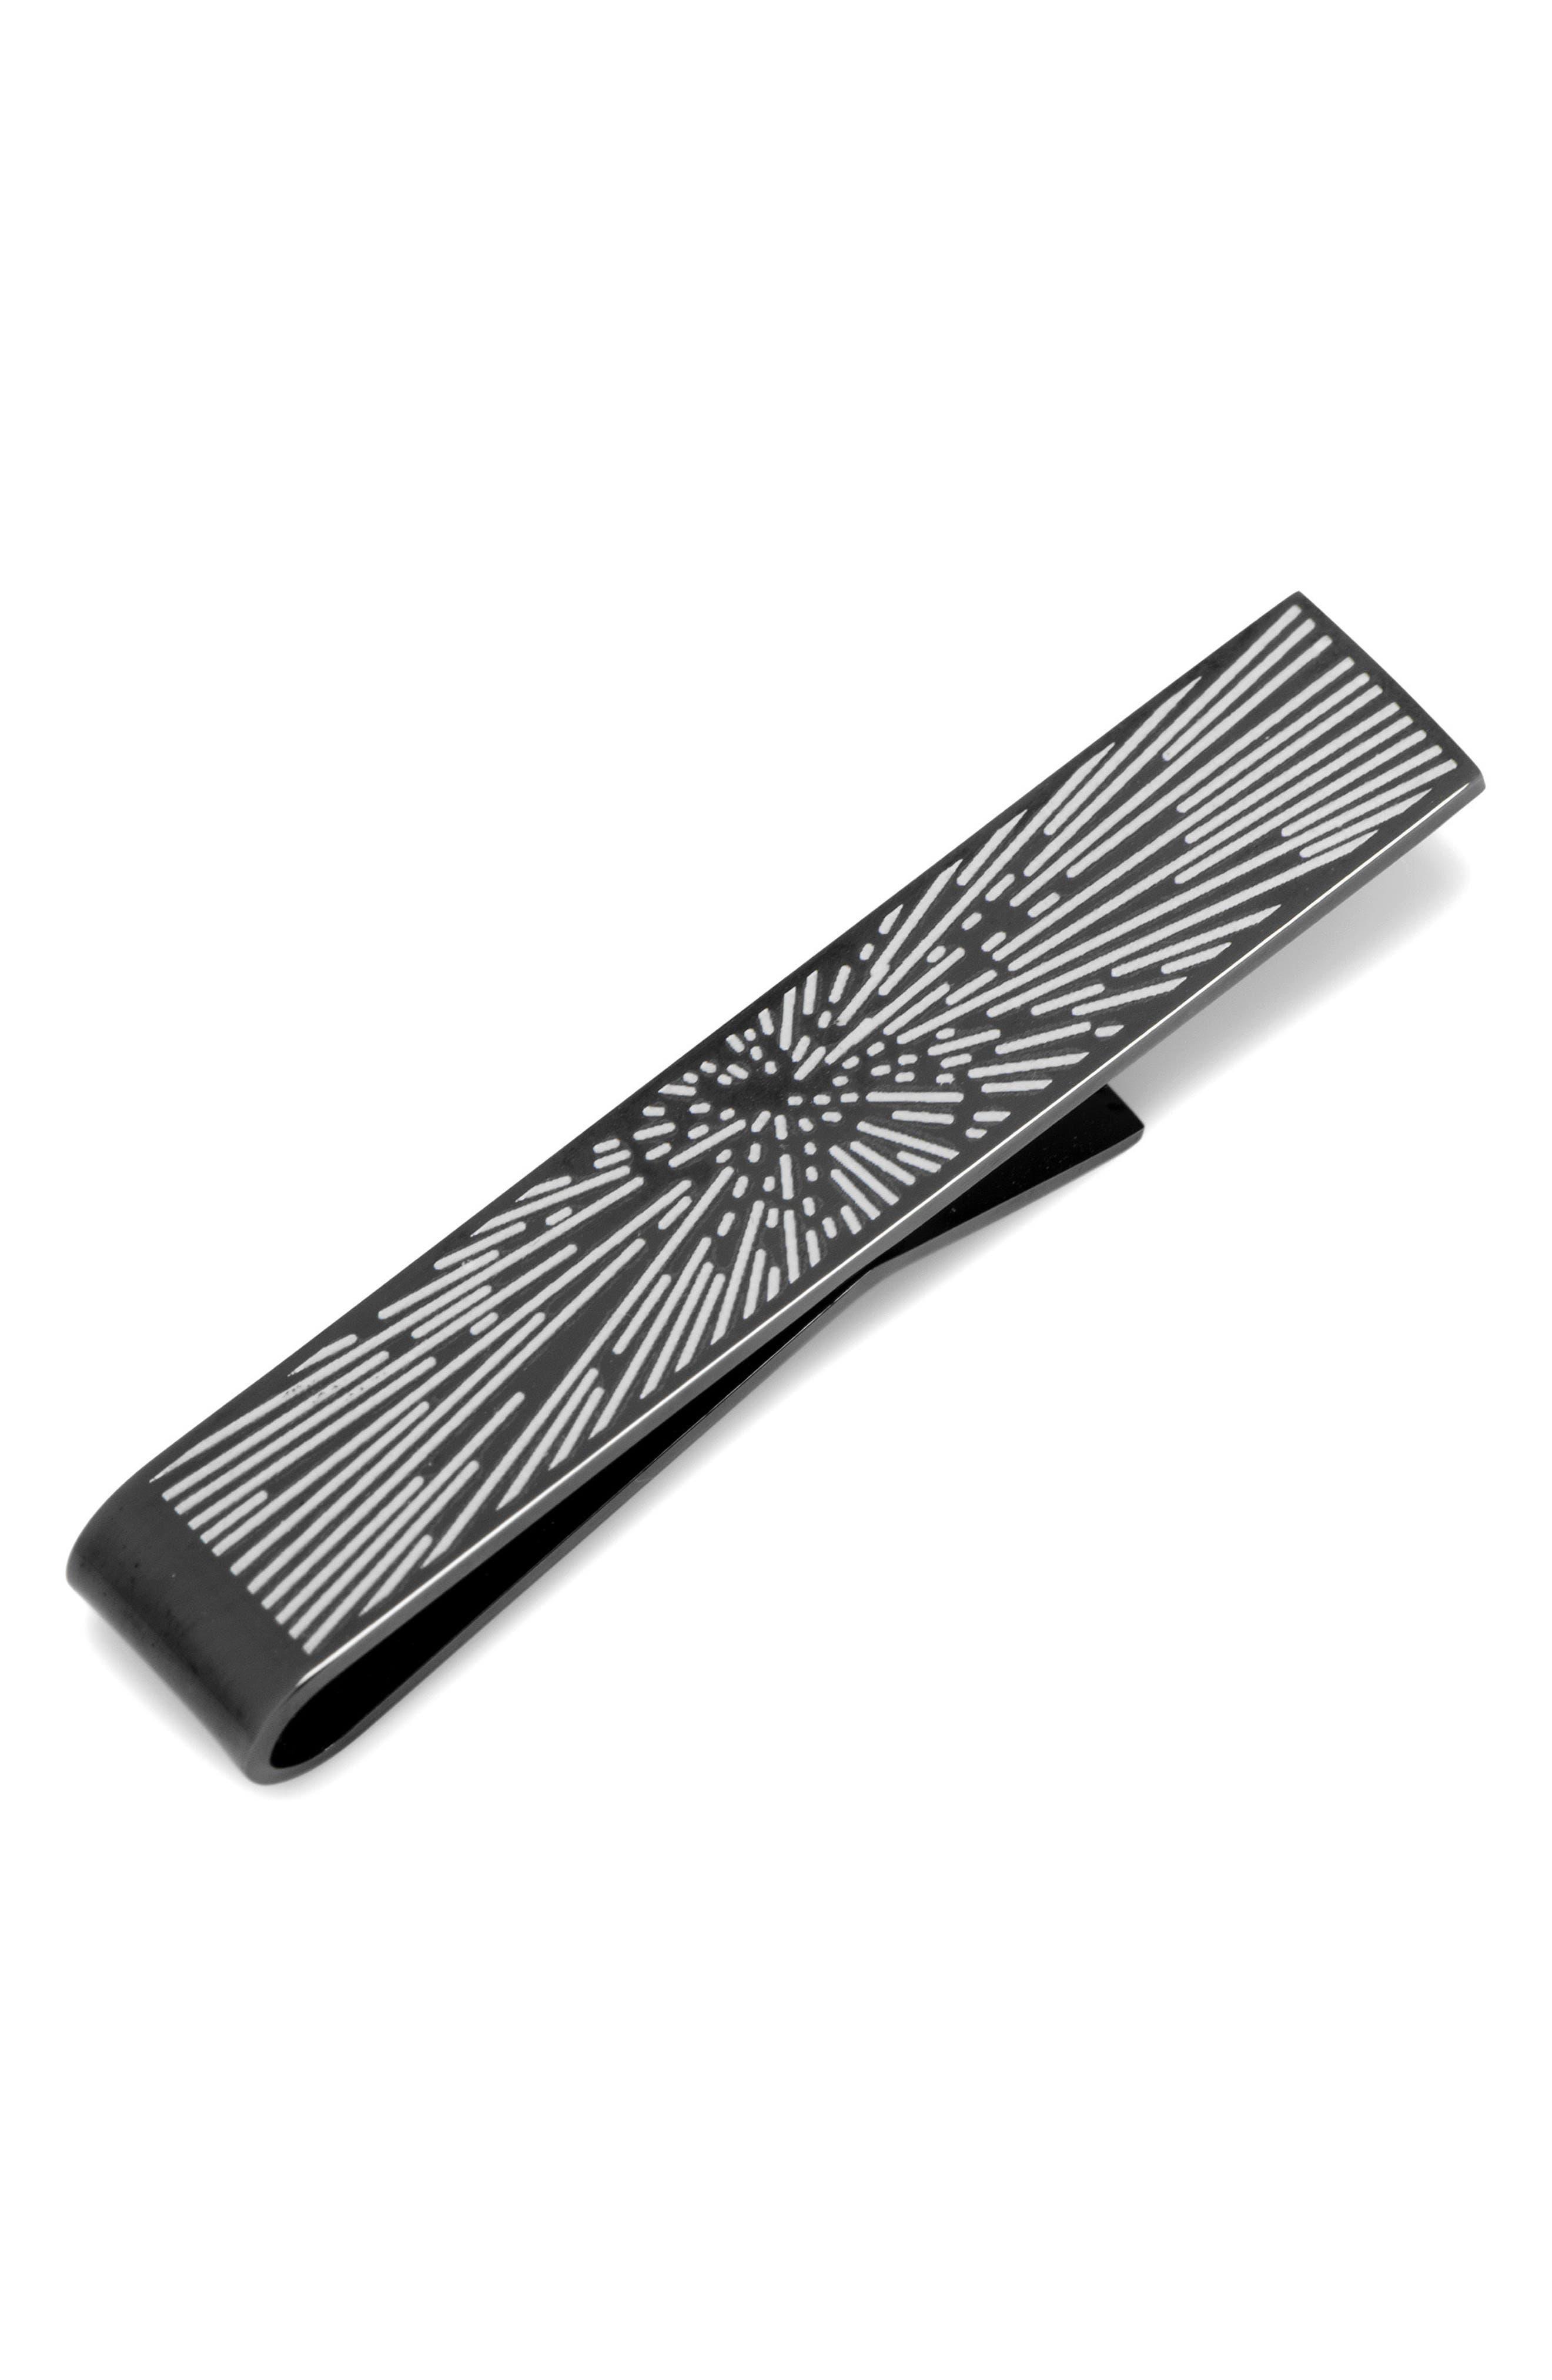 CUFFLINKS, INC. Star Wars Hyperspeed Glow in the Dark Tie Bar, Main, color, BLACK